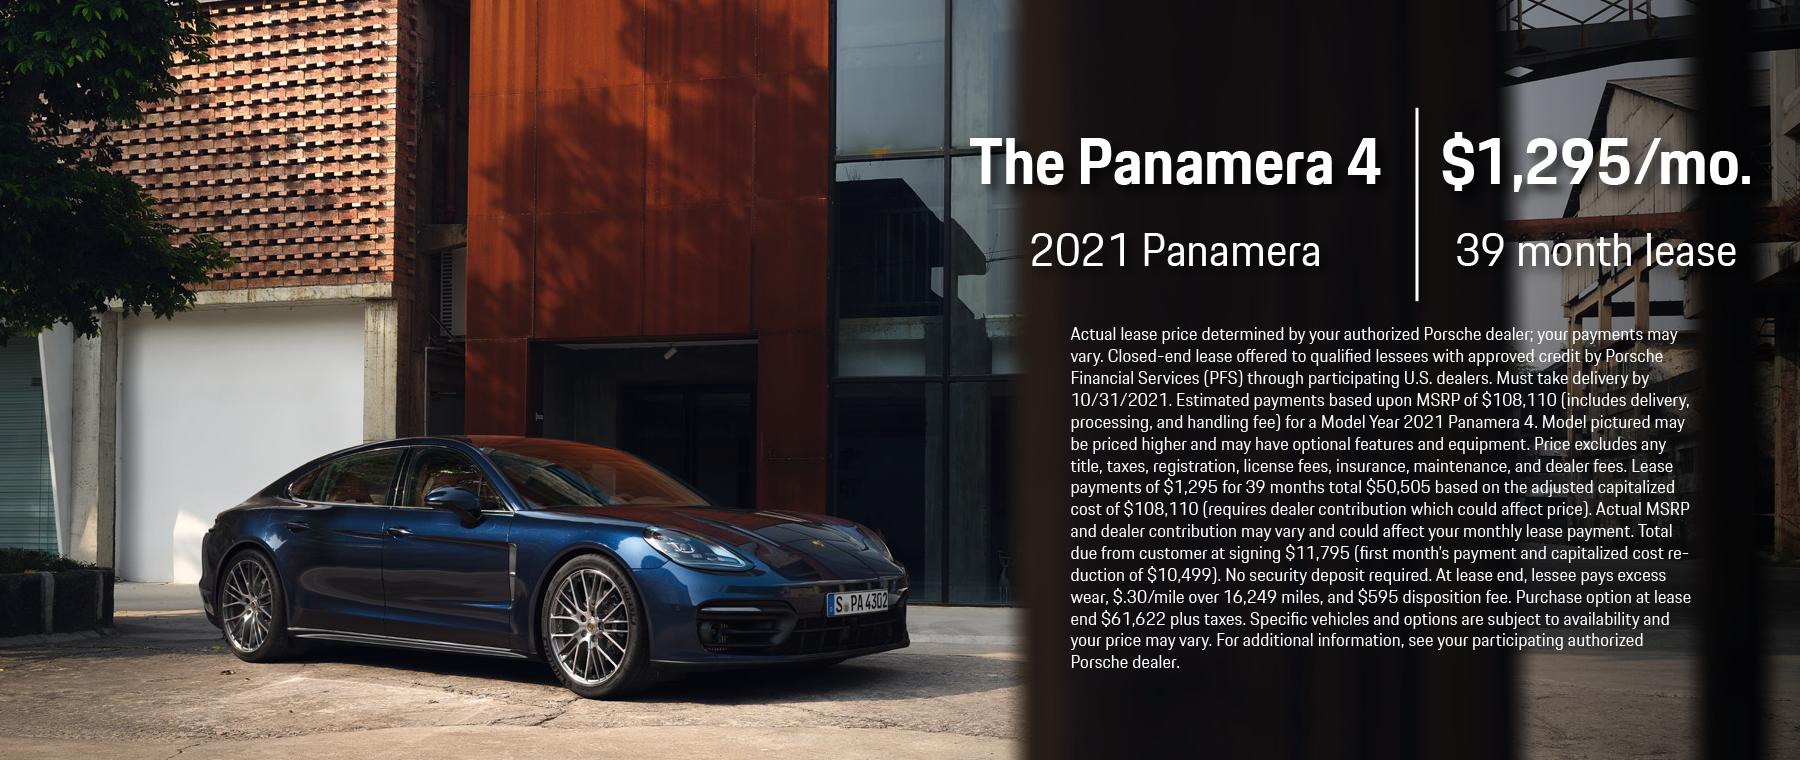 2021 Panamera 4